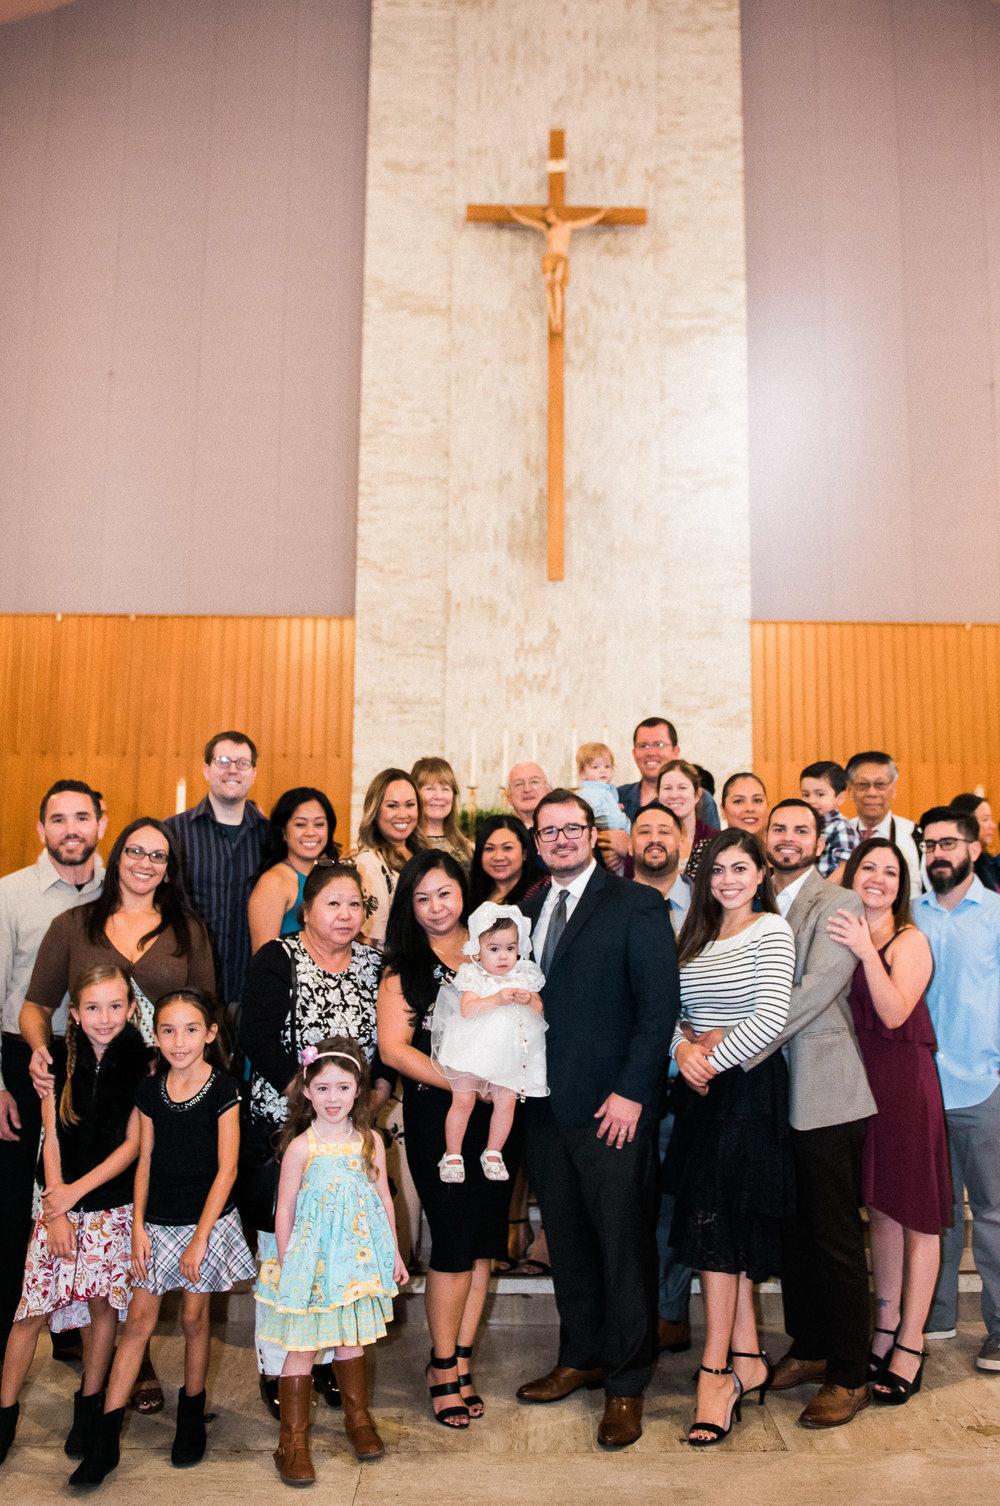 Bryan-Miraflor-Photo-Allison-Baptism-Church-20171014-0220.jpg